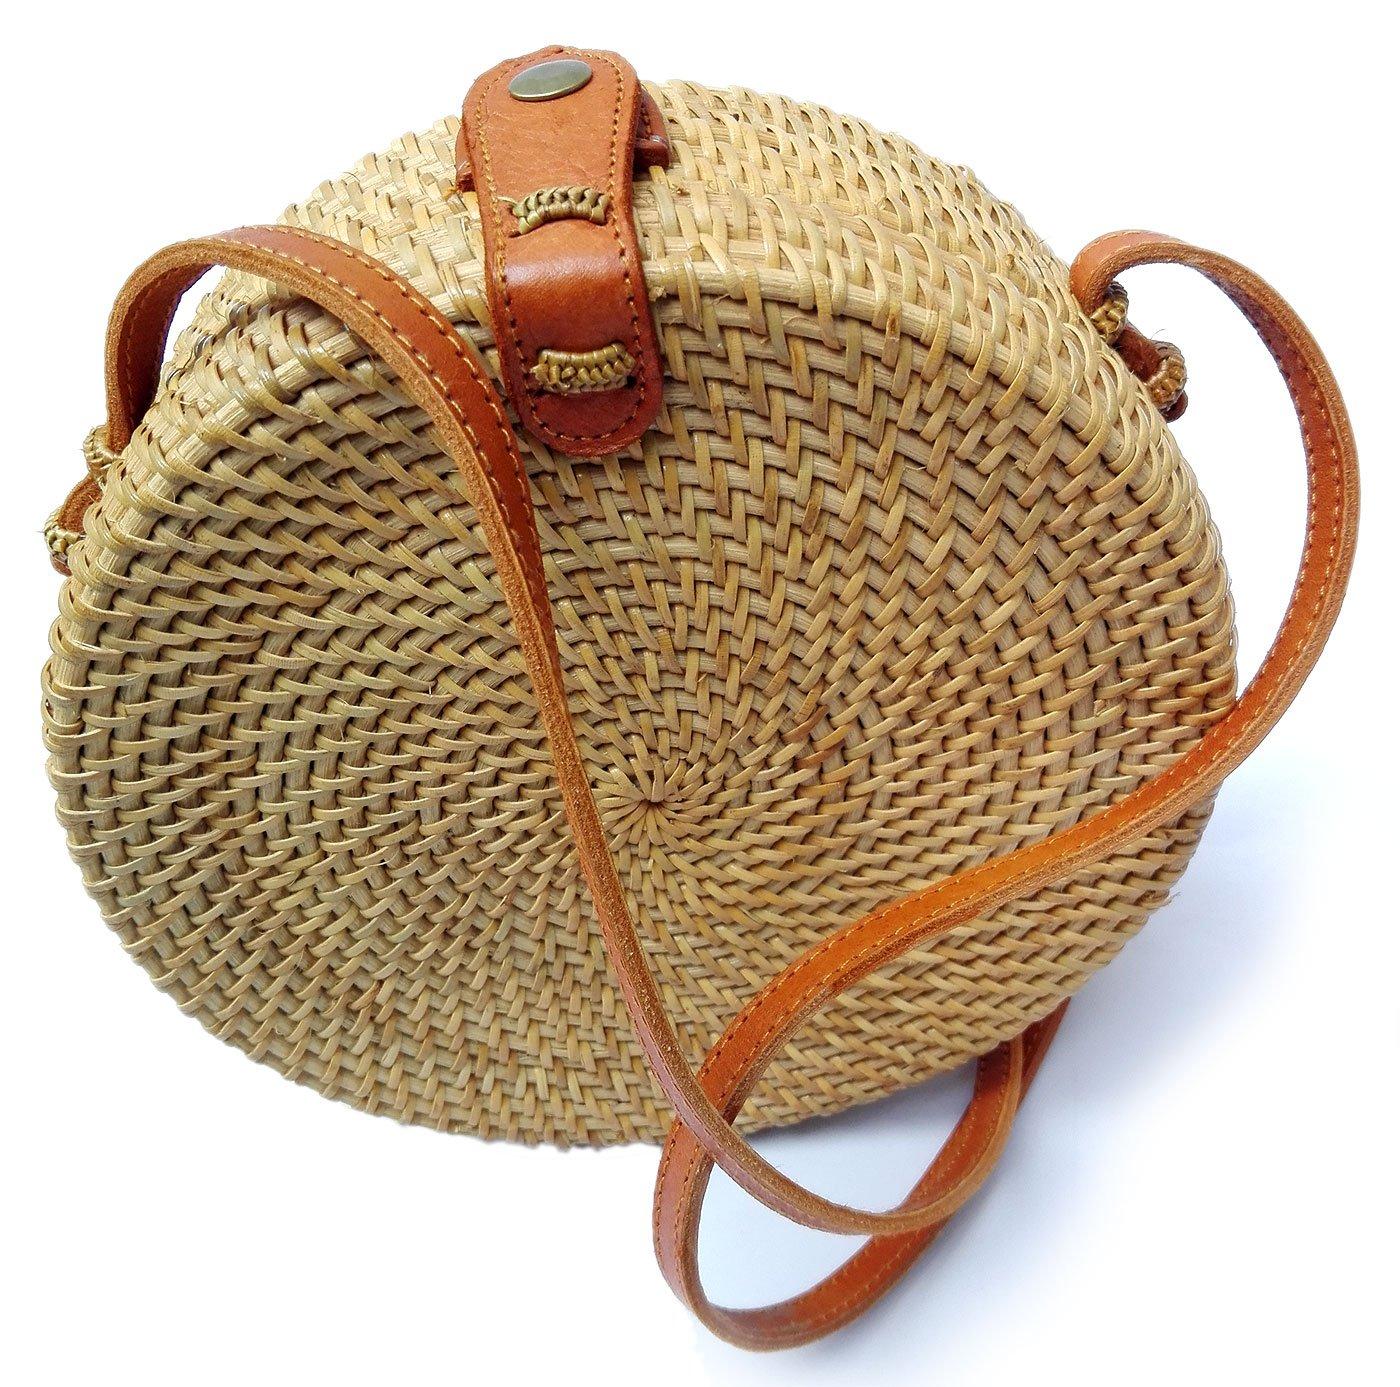 Bali Rattan - Handwoven Round Rattan Bag (Plain Weave Leather Closure) by Bali Rattan (Image #1)